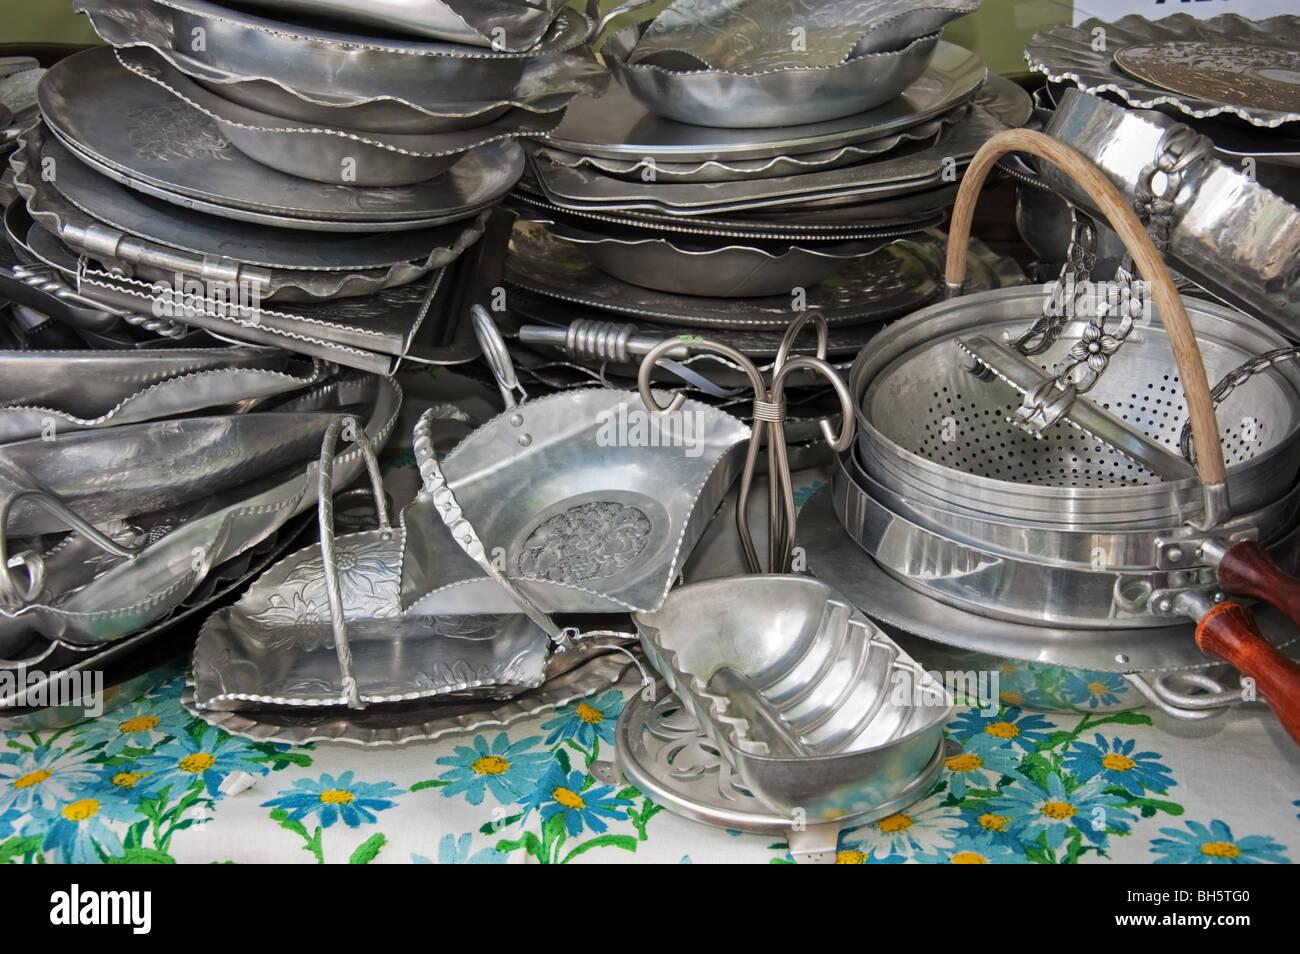 Photo Shows Silver Stockfotos & Photo Shows Silver Bilder - Alamy